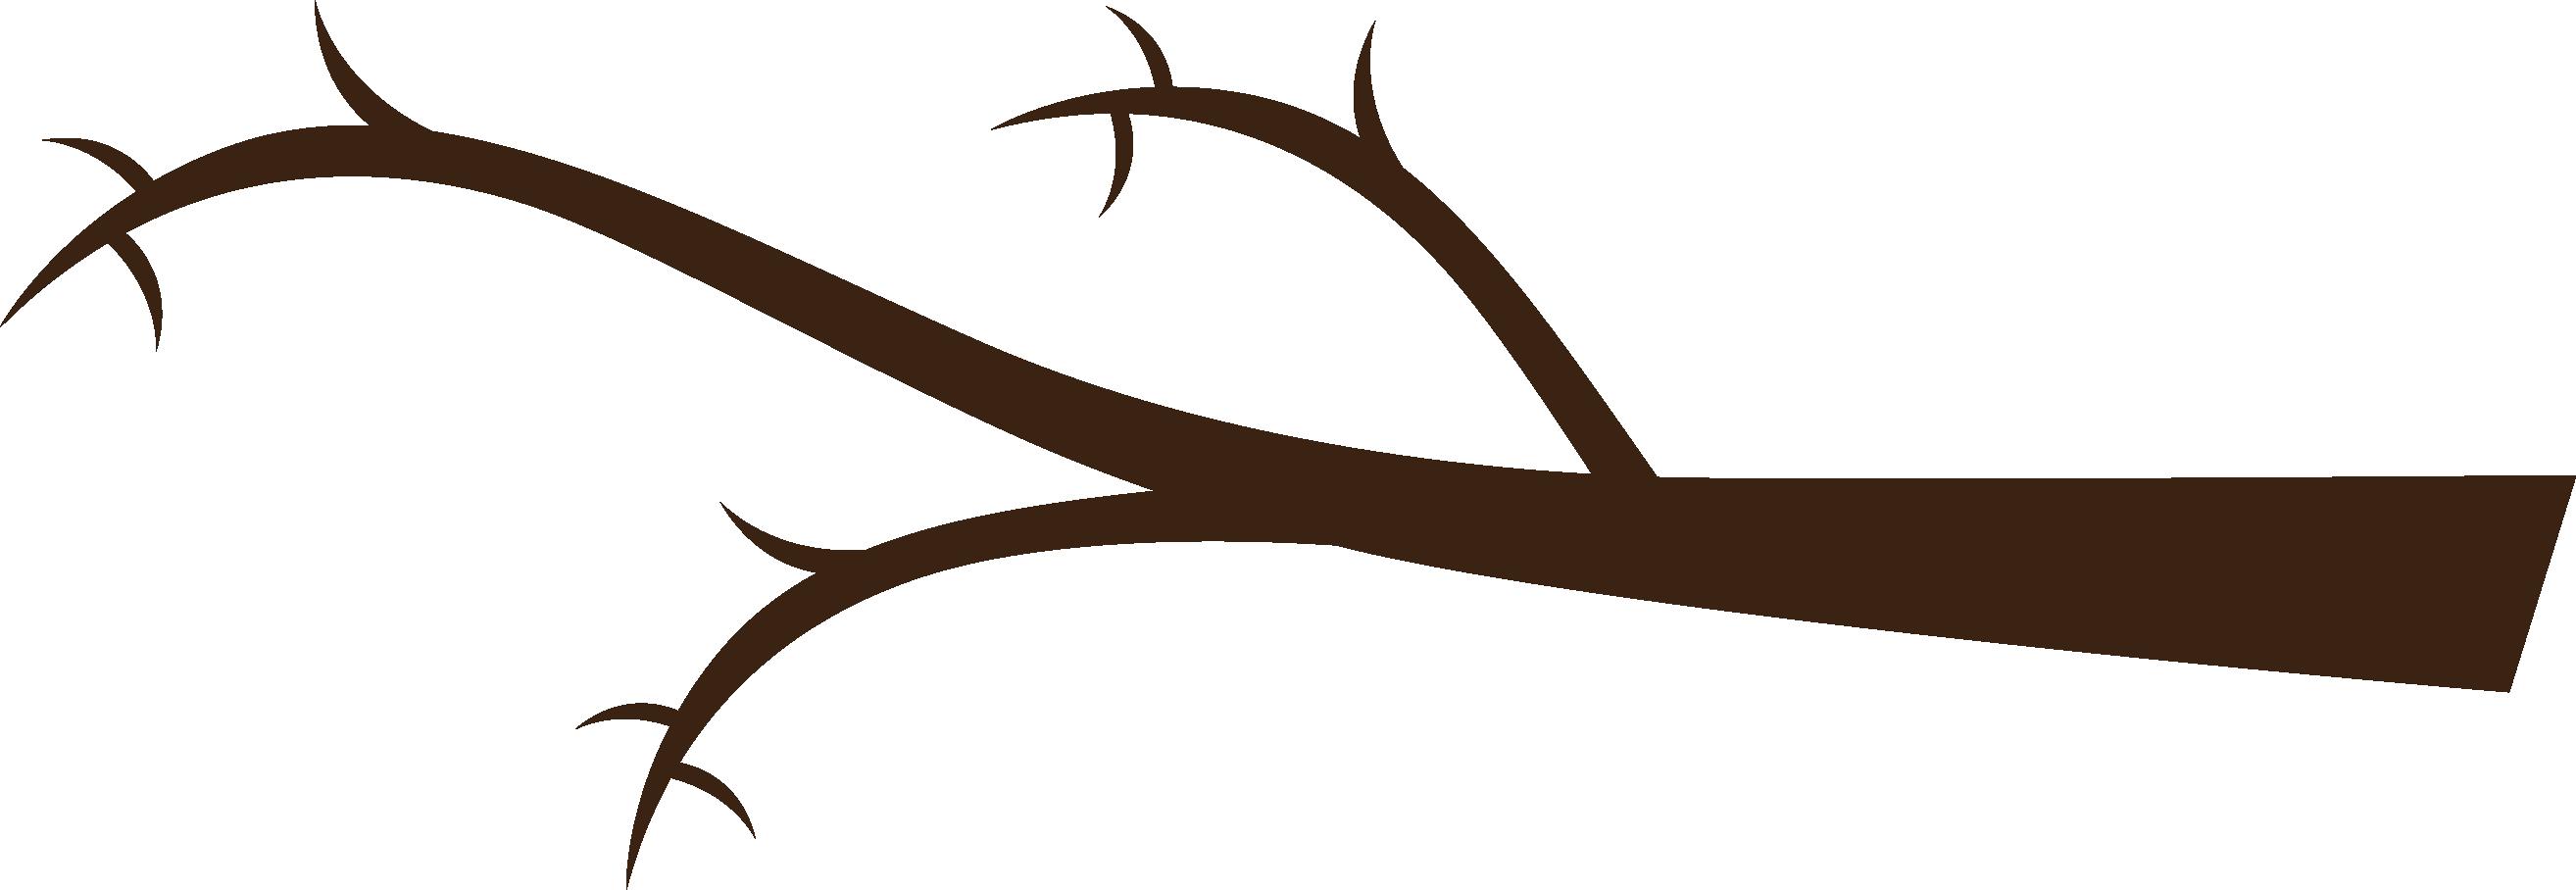 Lovely Tree Branch Clip Art ..-Lovely Tree Branch Clip Art ..-12